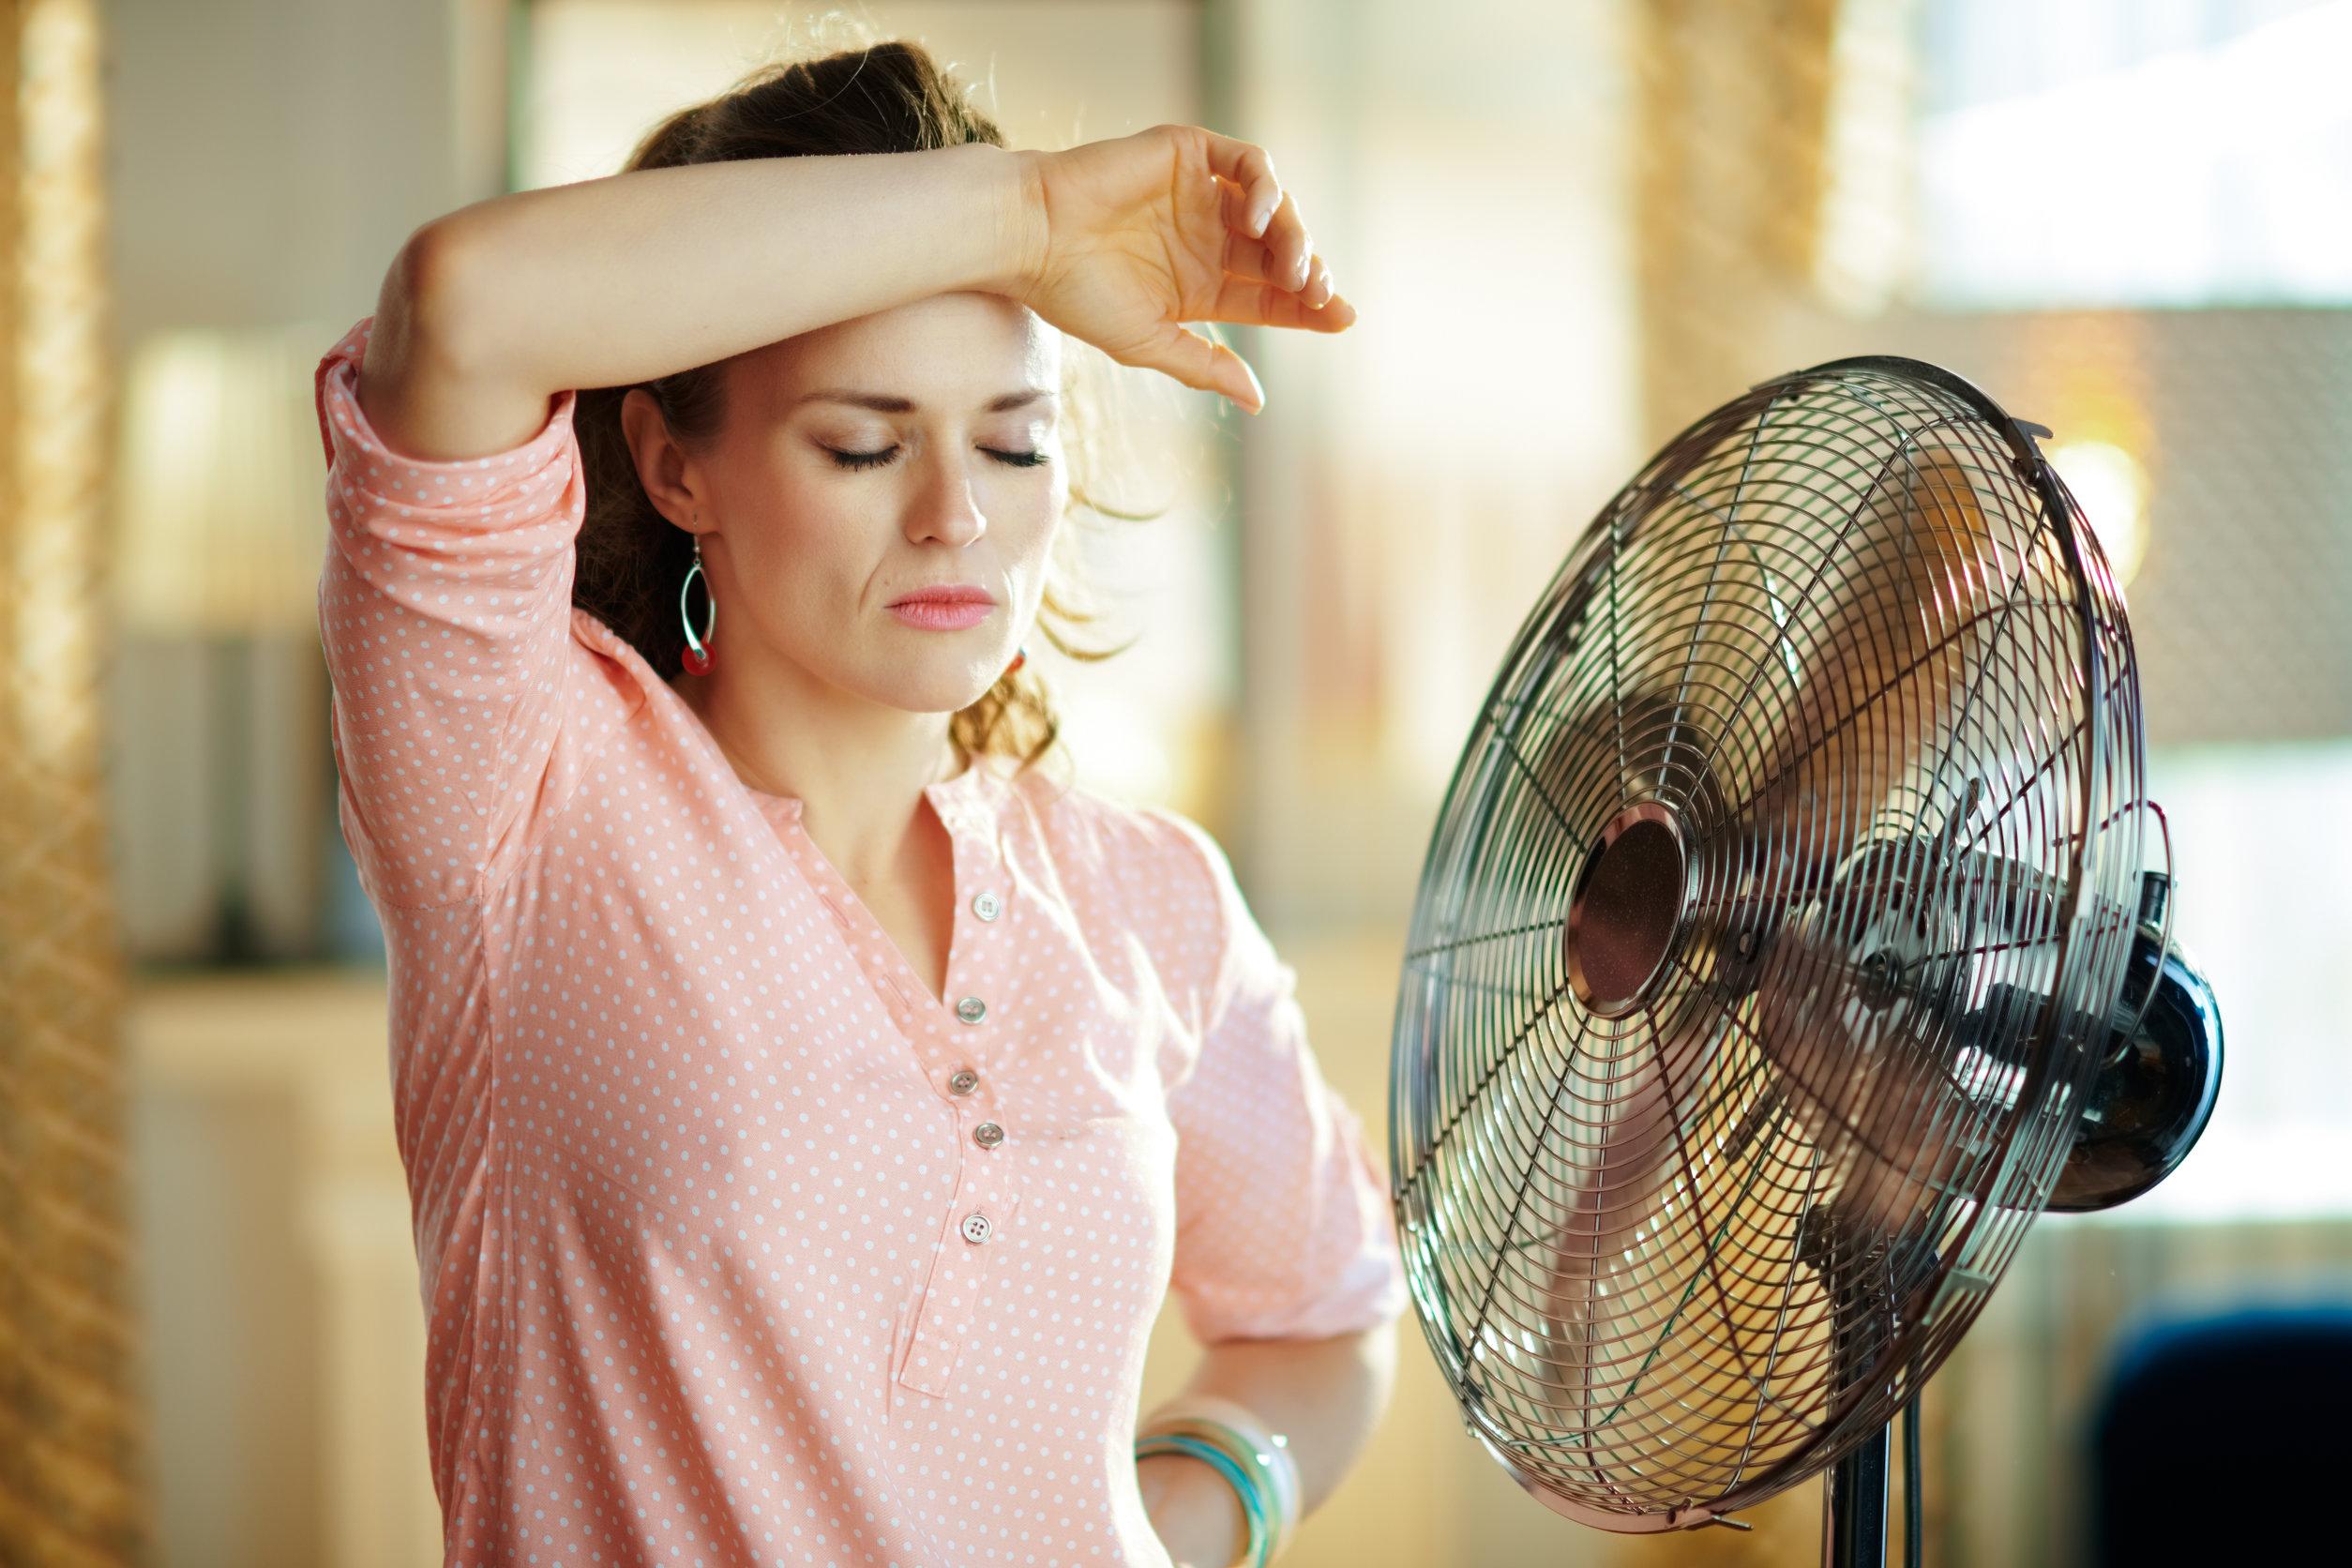 Mujer con mucho calor